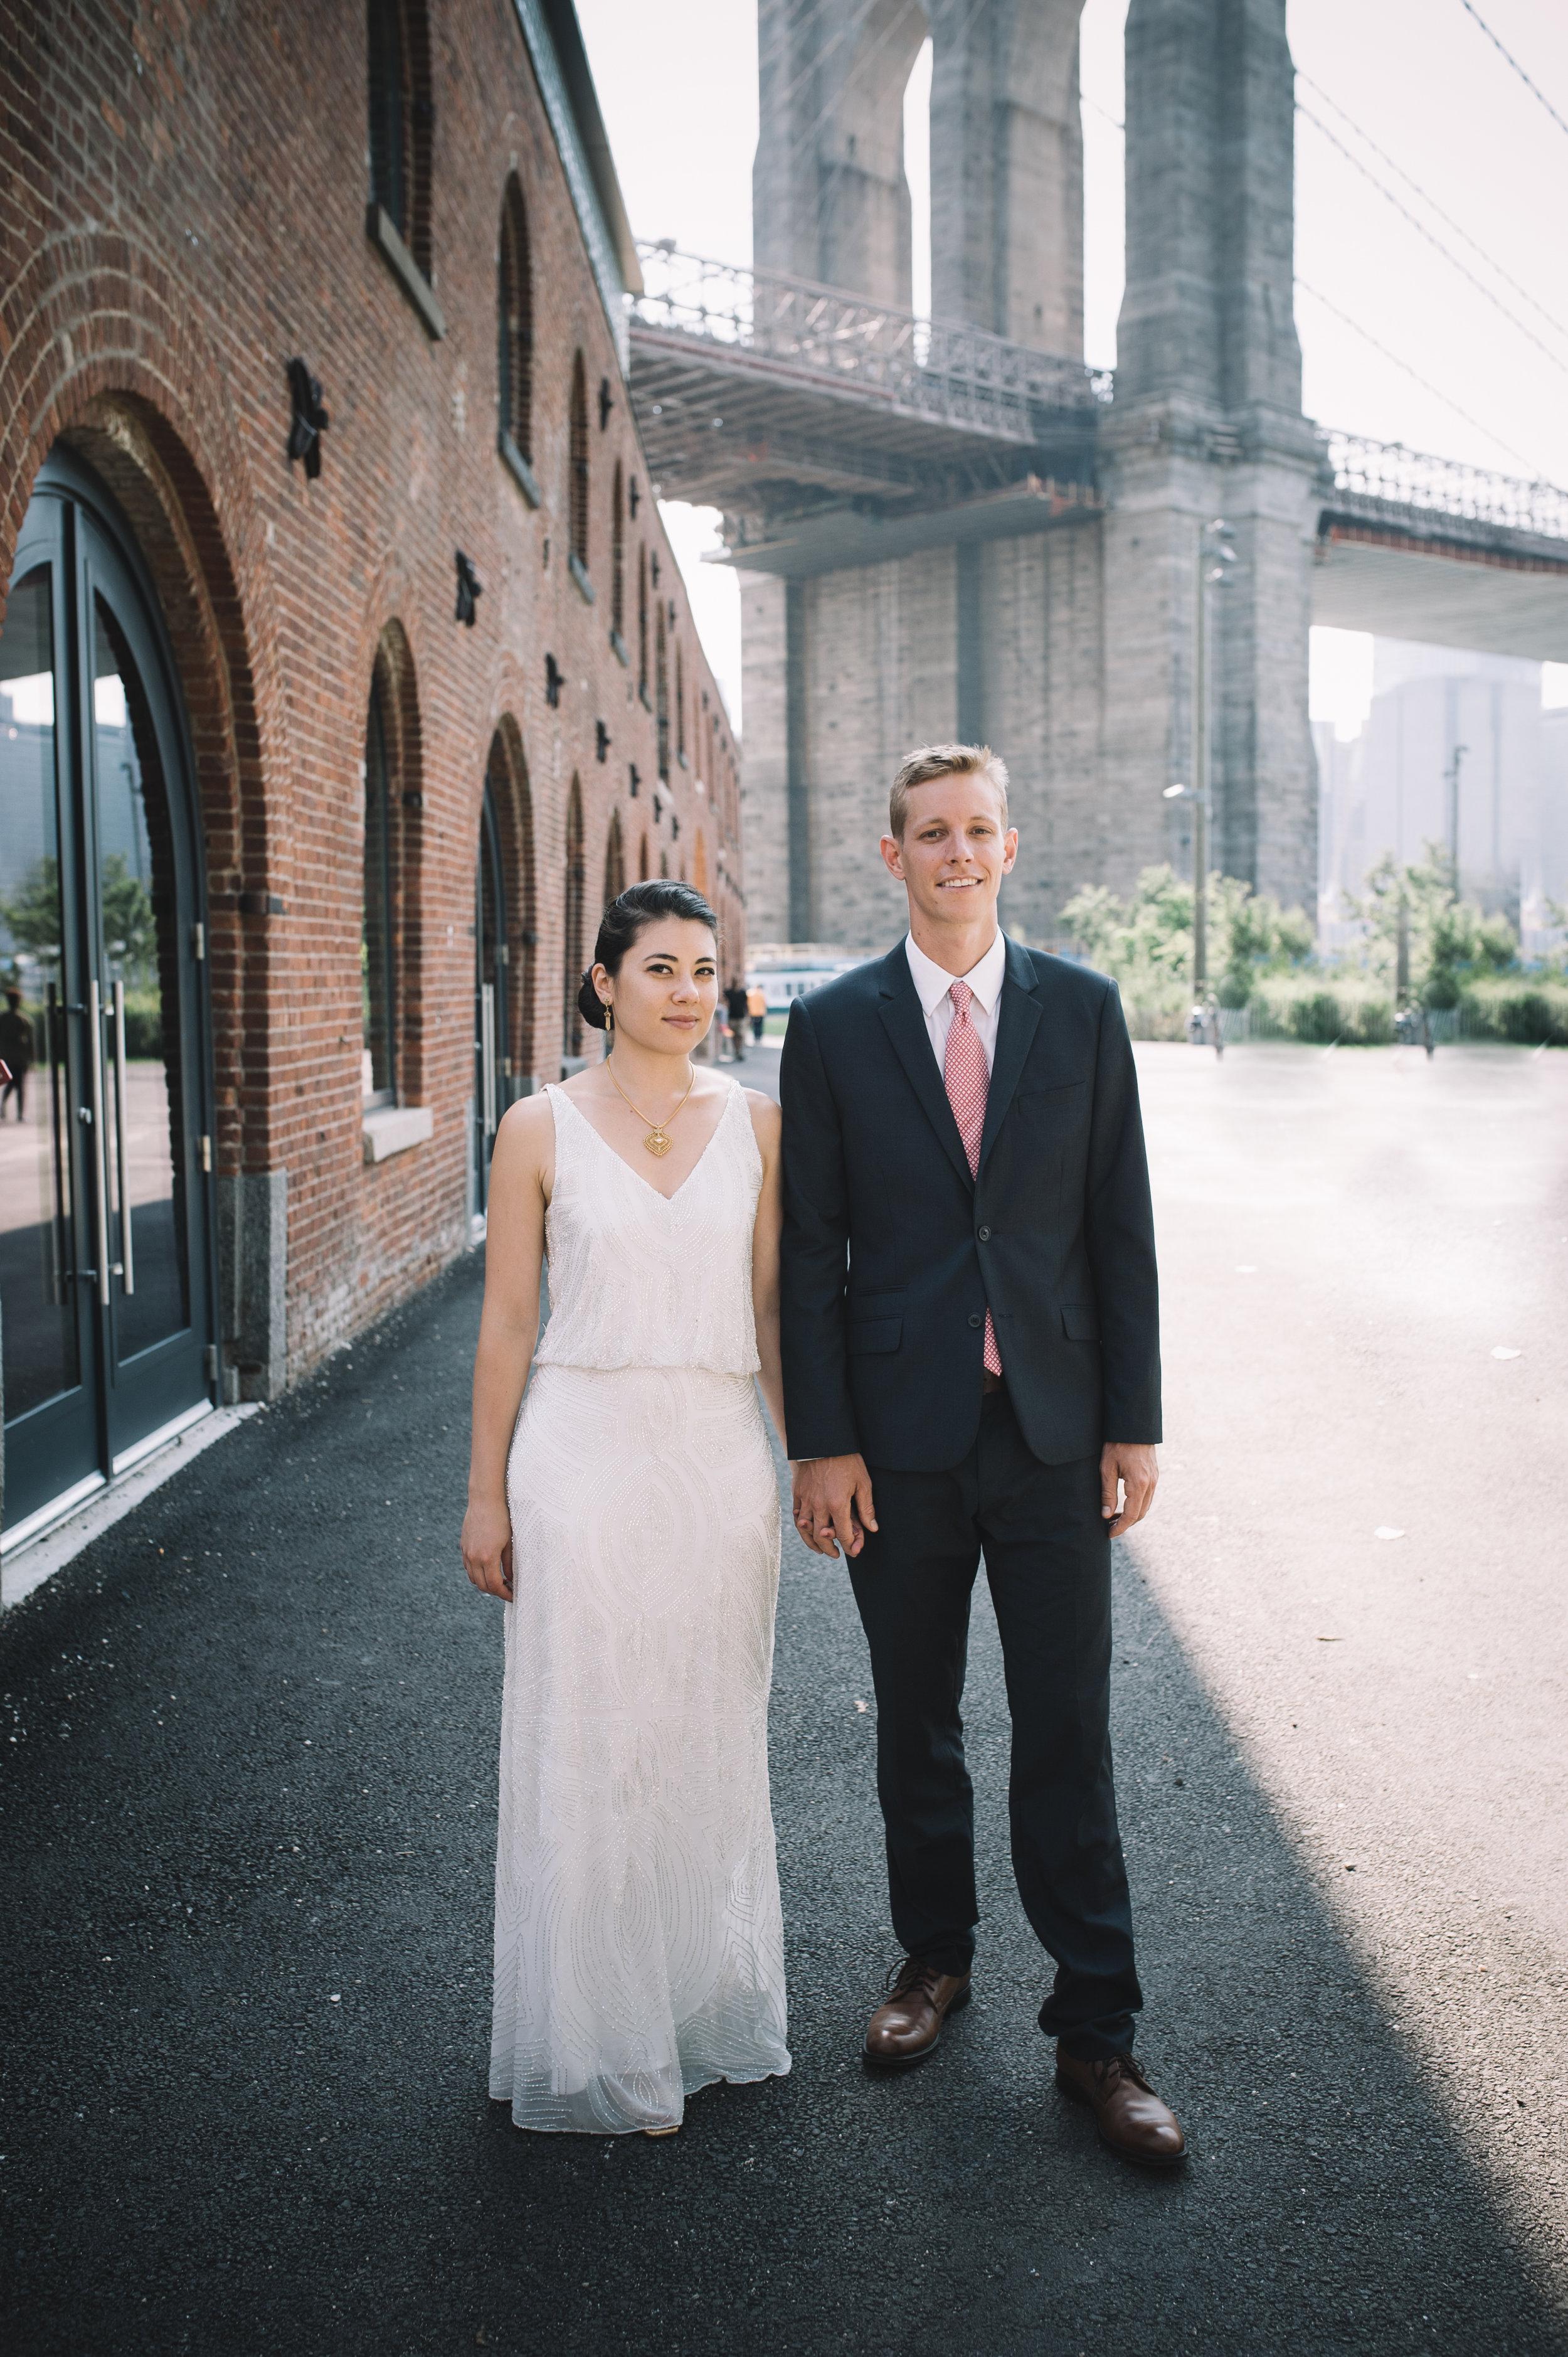 Clark&Arielle-86.jpg